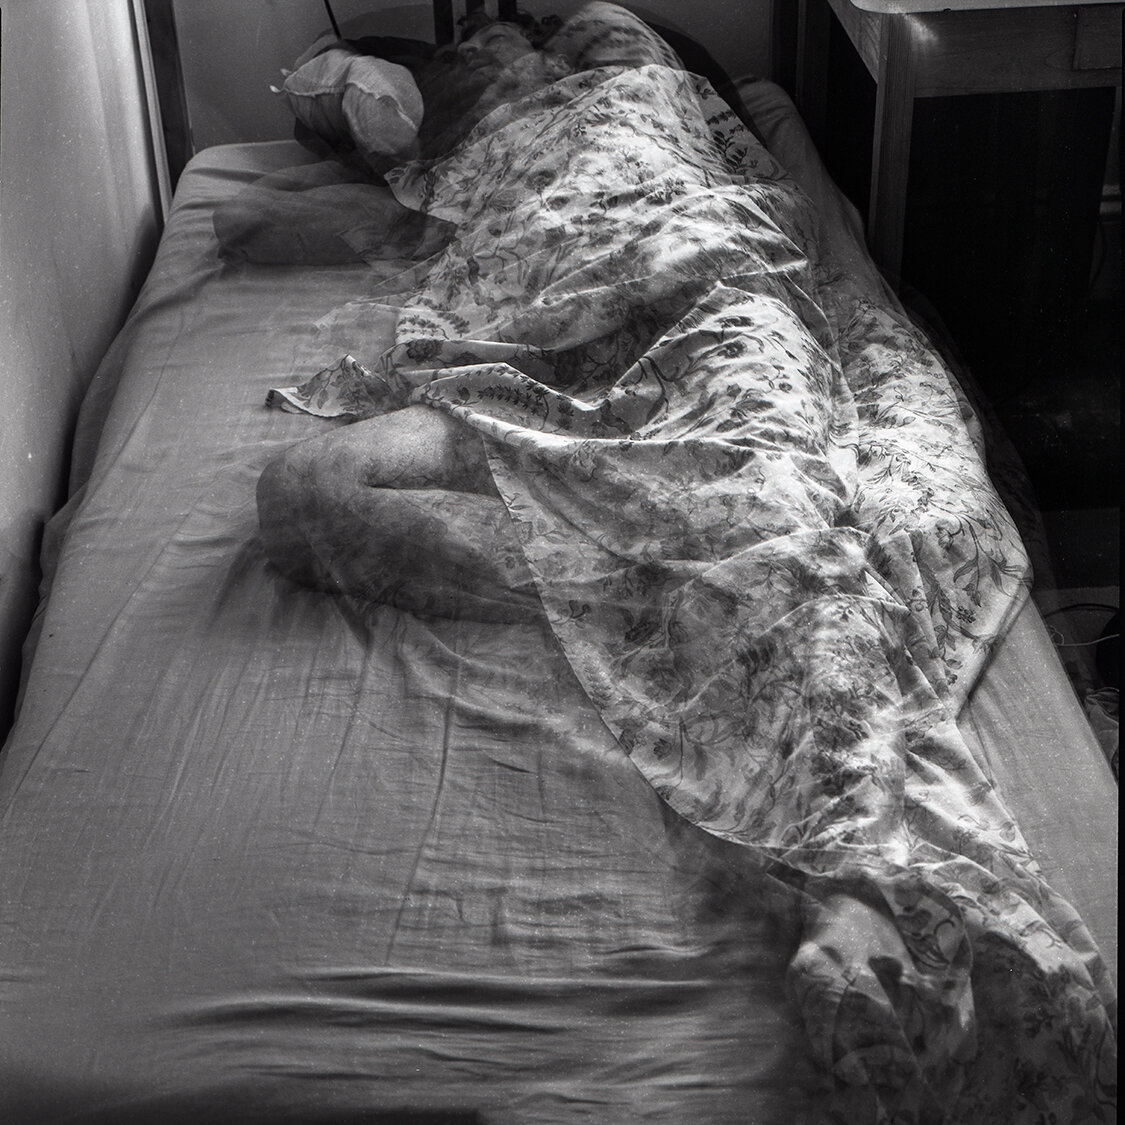 NICOLAI - My old bed 2 - nicolai gregory.jpg